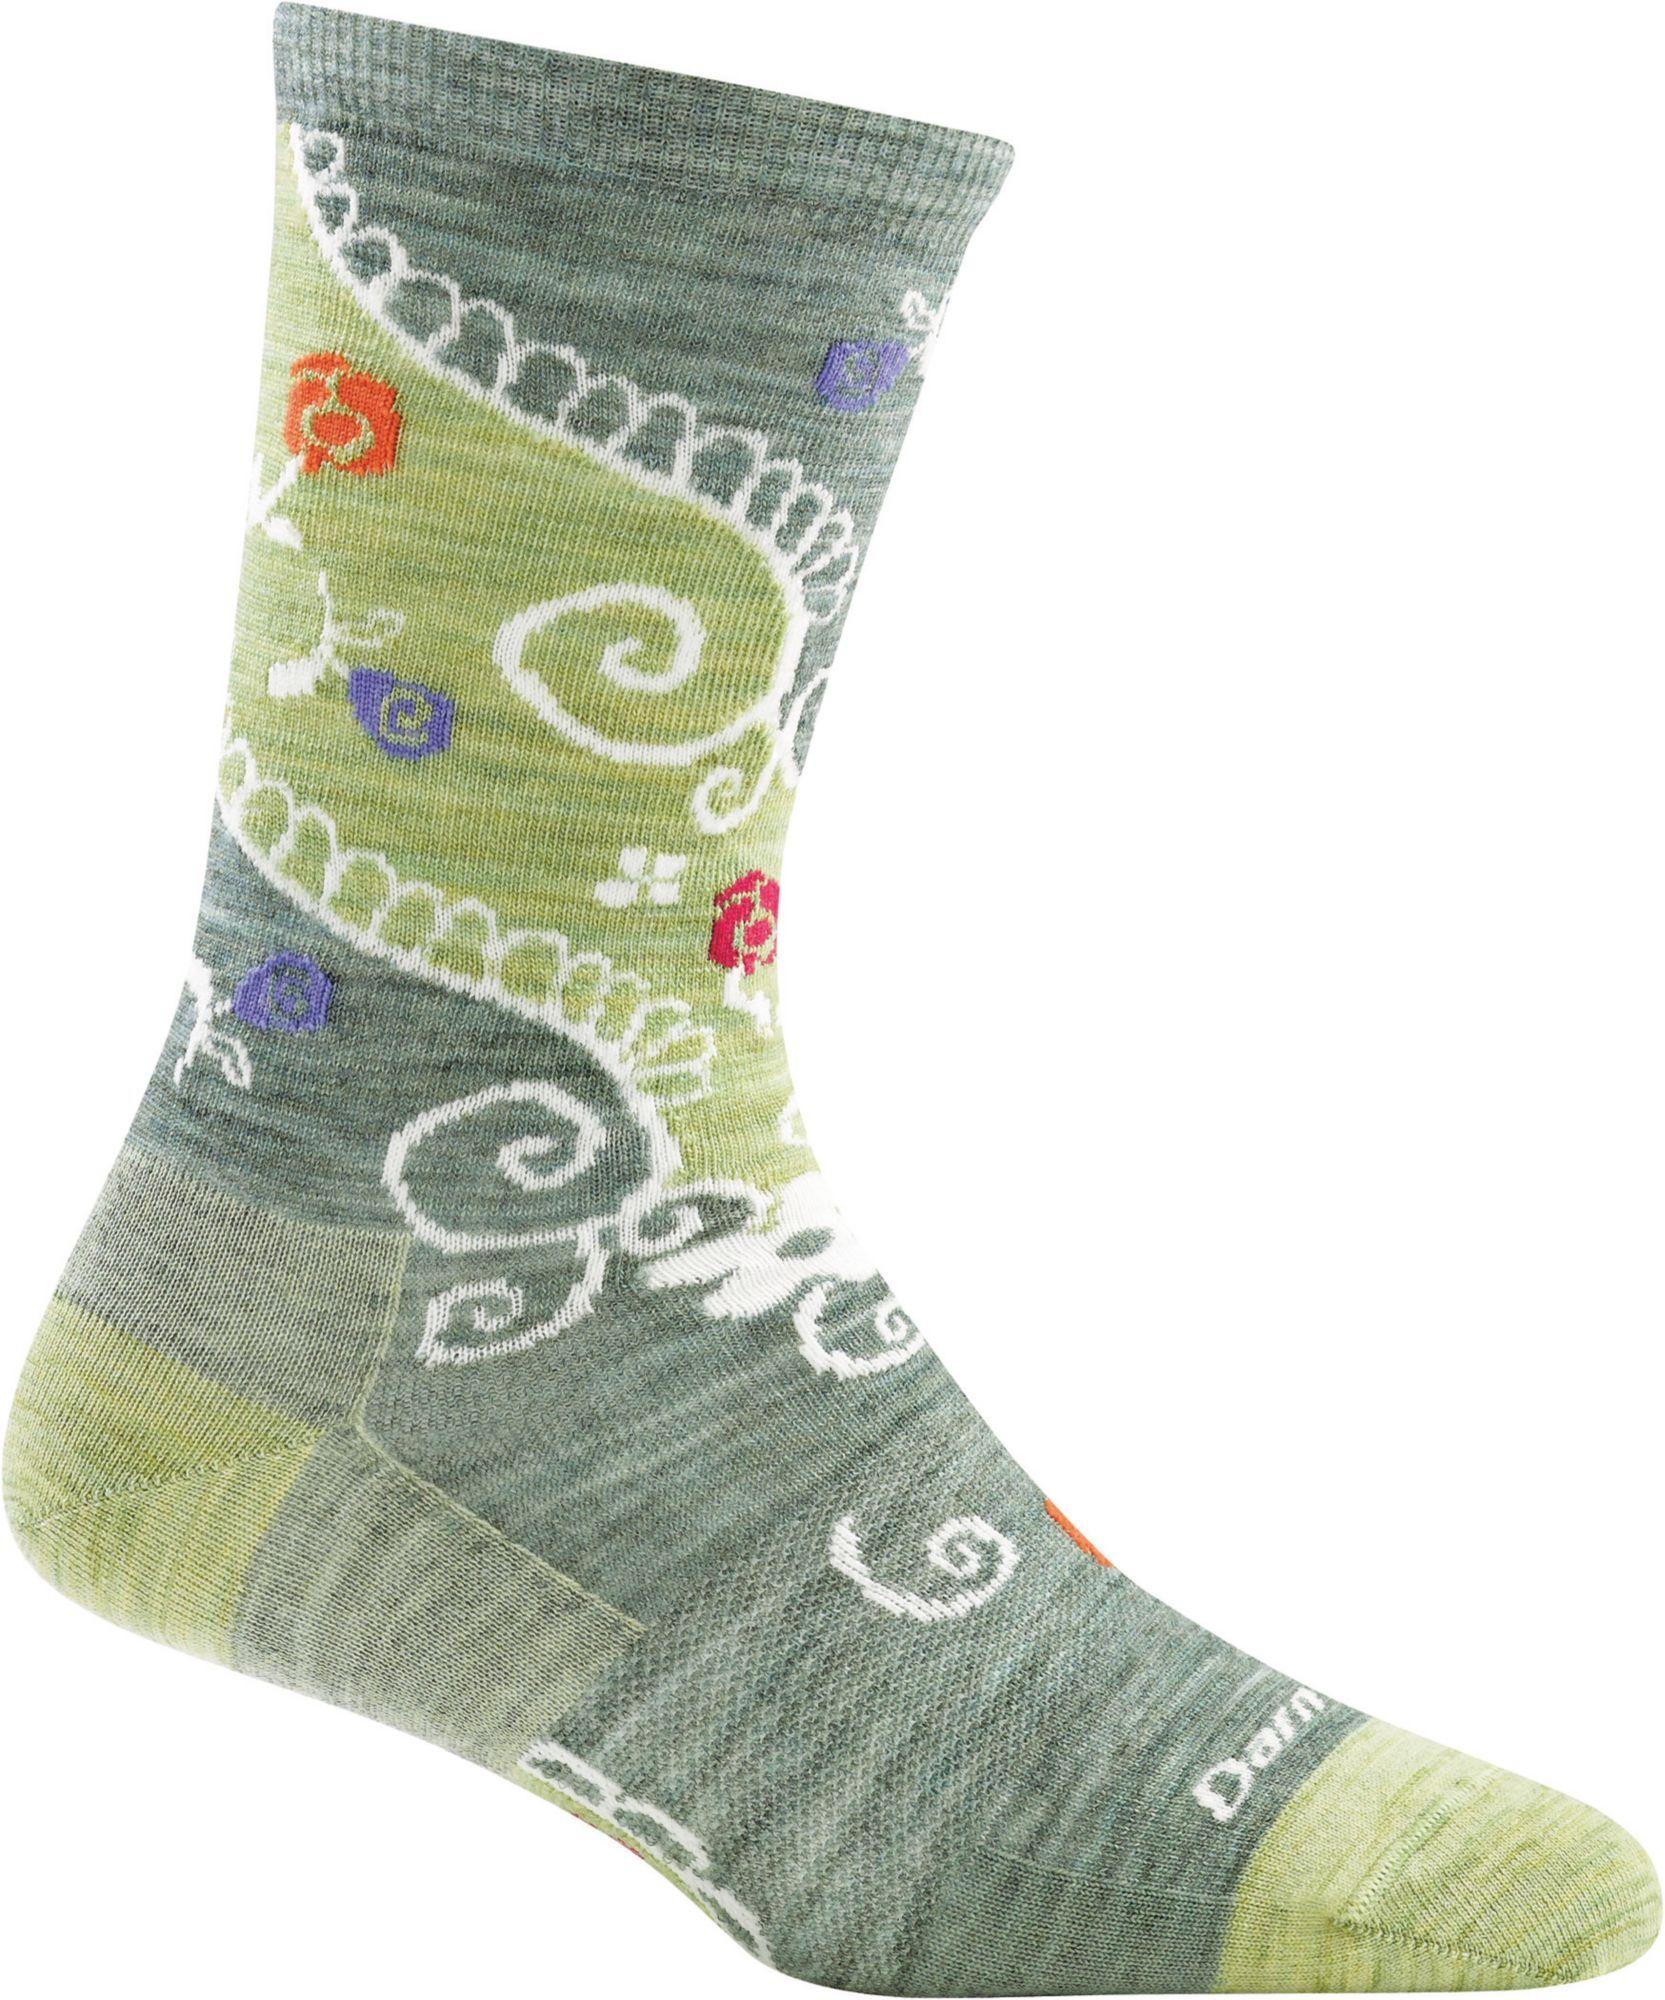 Darn Tough Women's Twisted Garden Crew Socks, Small, Green